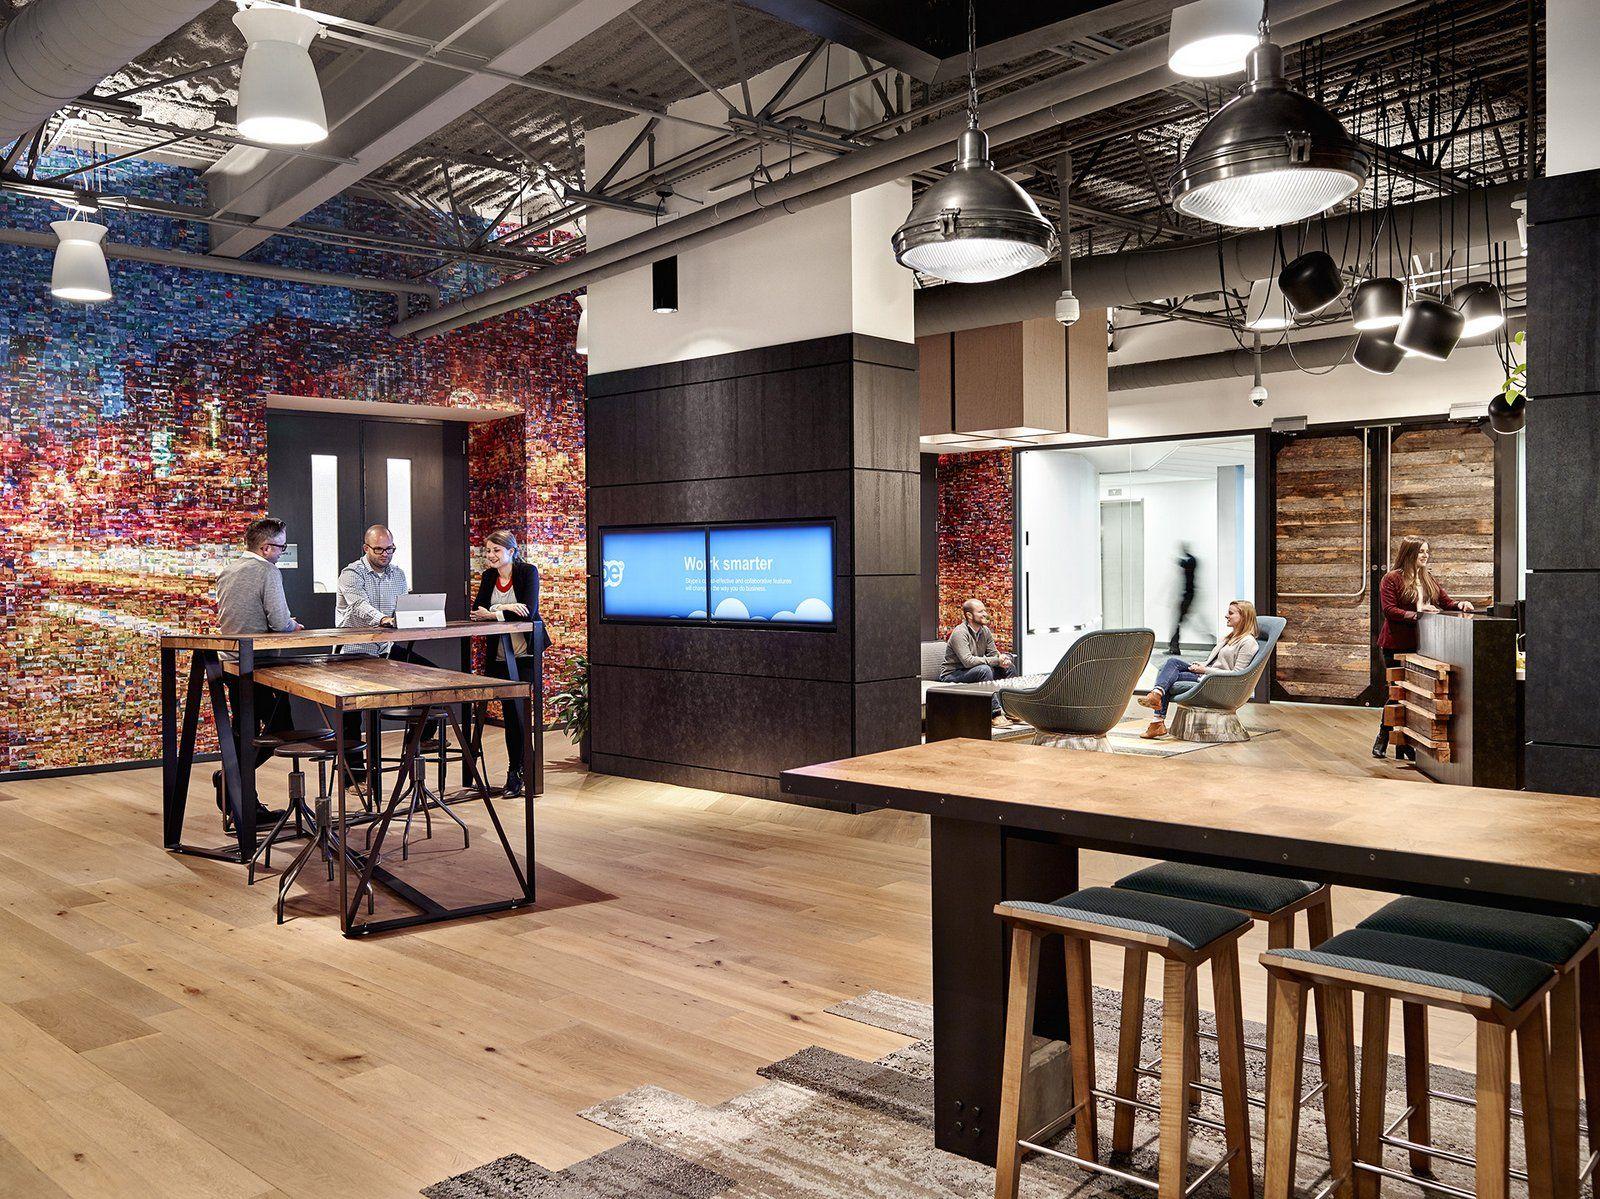 google office snapshots. Microsoft Offices - Nashville Office Snapshots Google O